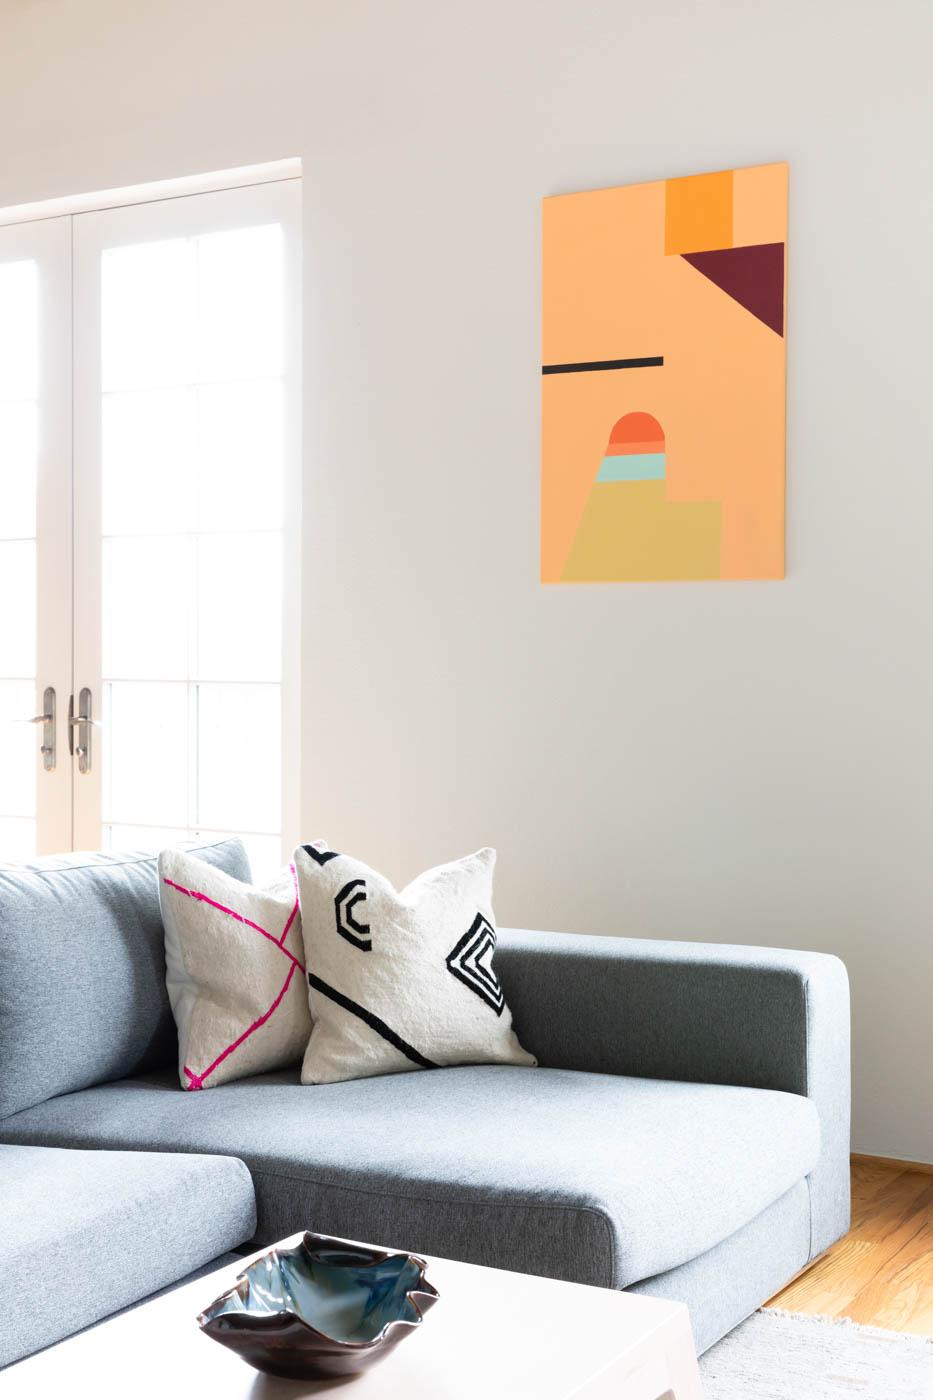 ArtistLoft-DenverCO-natural-light-photography-studio-lifestyle-photoshoot-location-editorial-commercial-photography-18.jpg